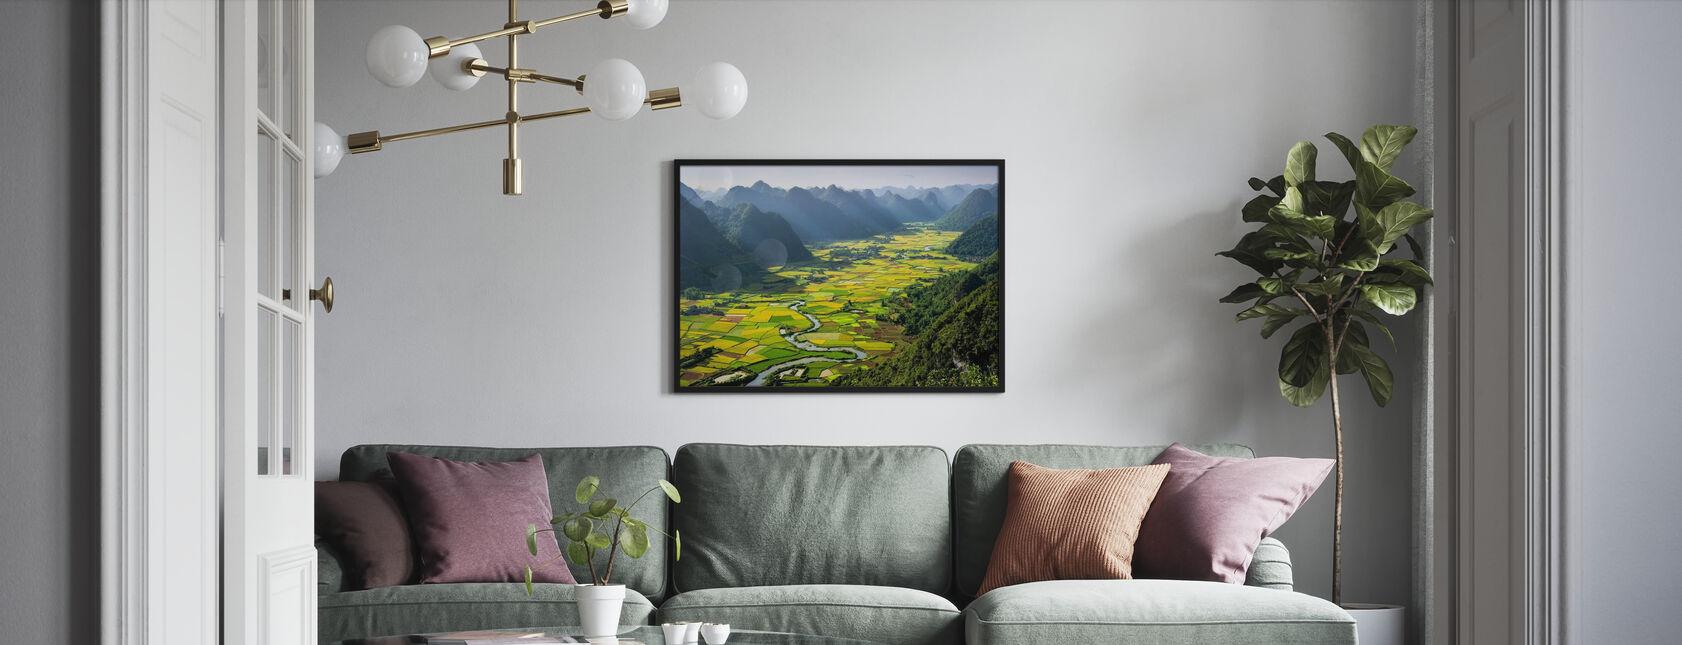 Bacha-Tal - Poster - Wohnzimmer